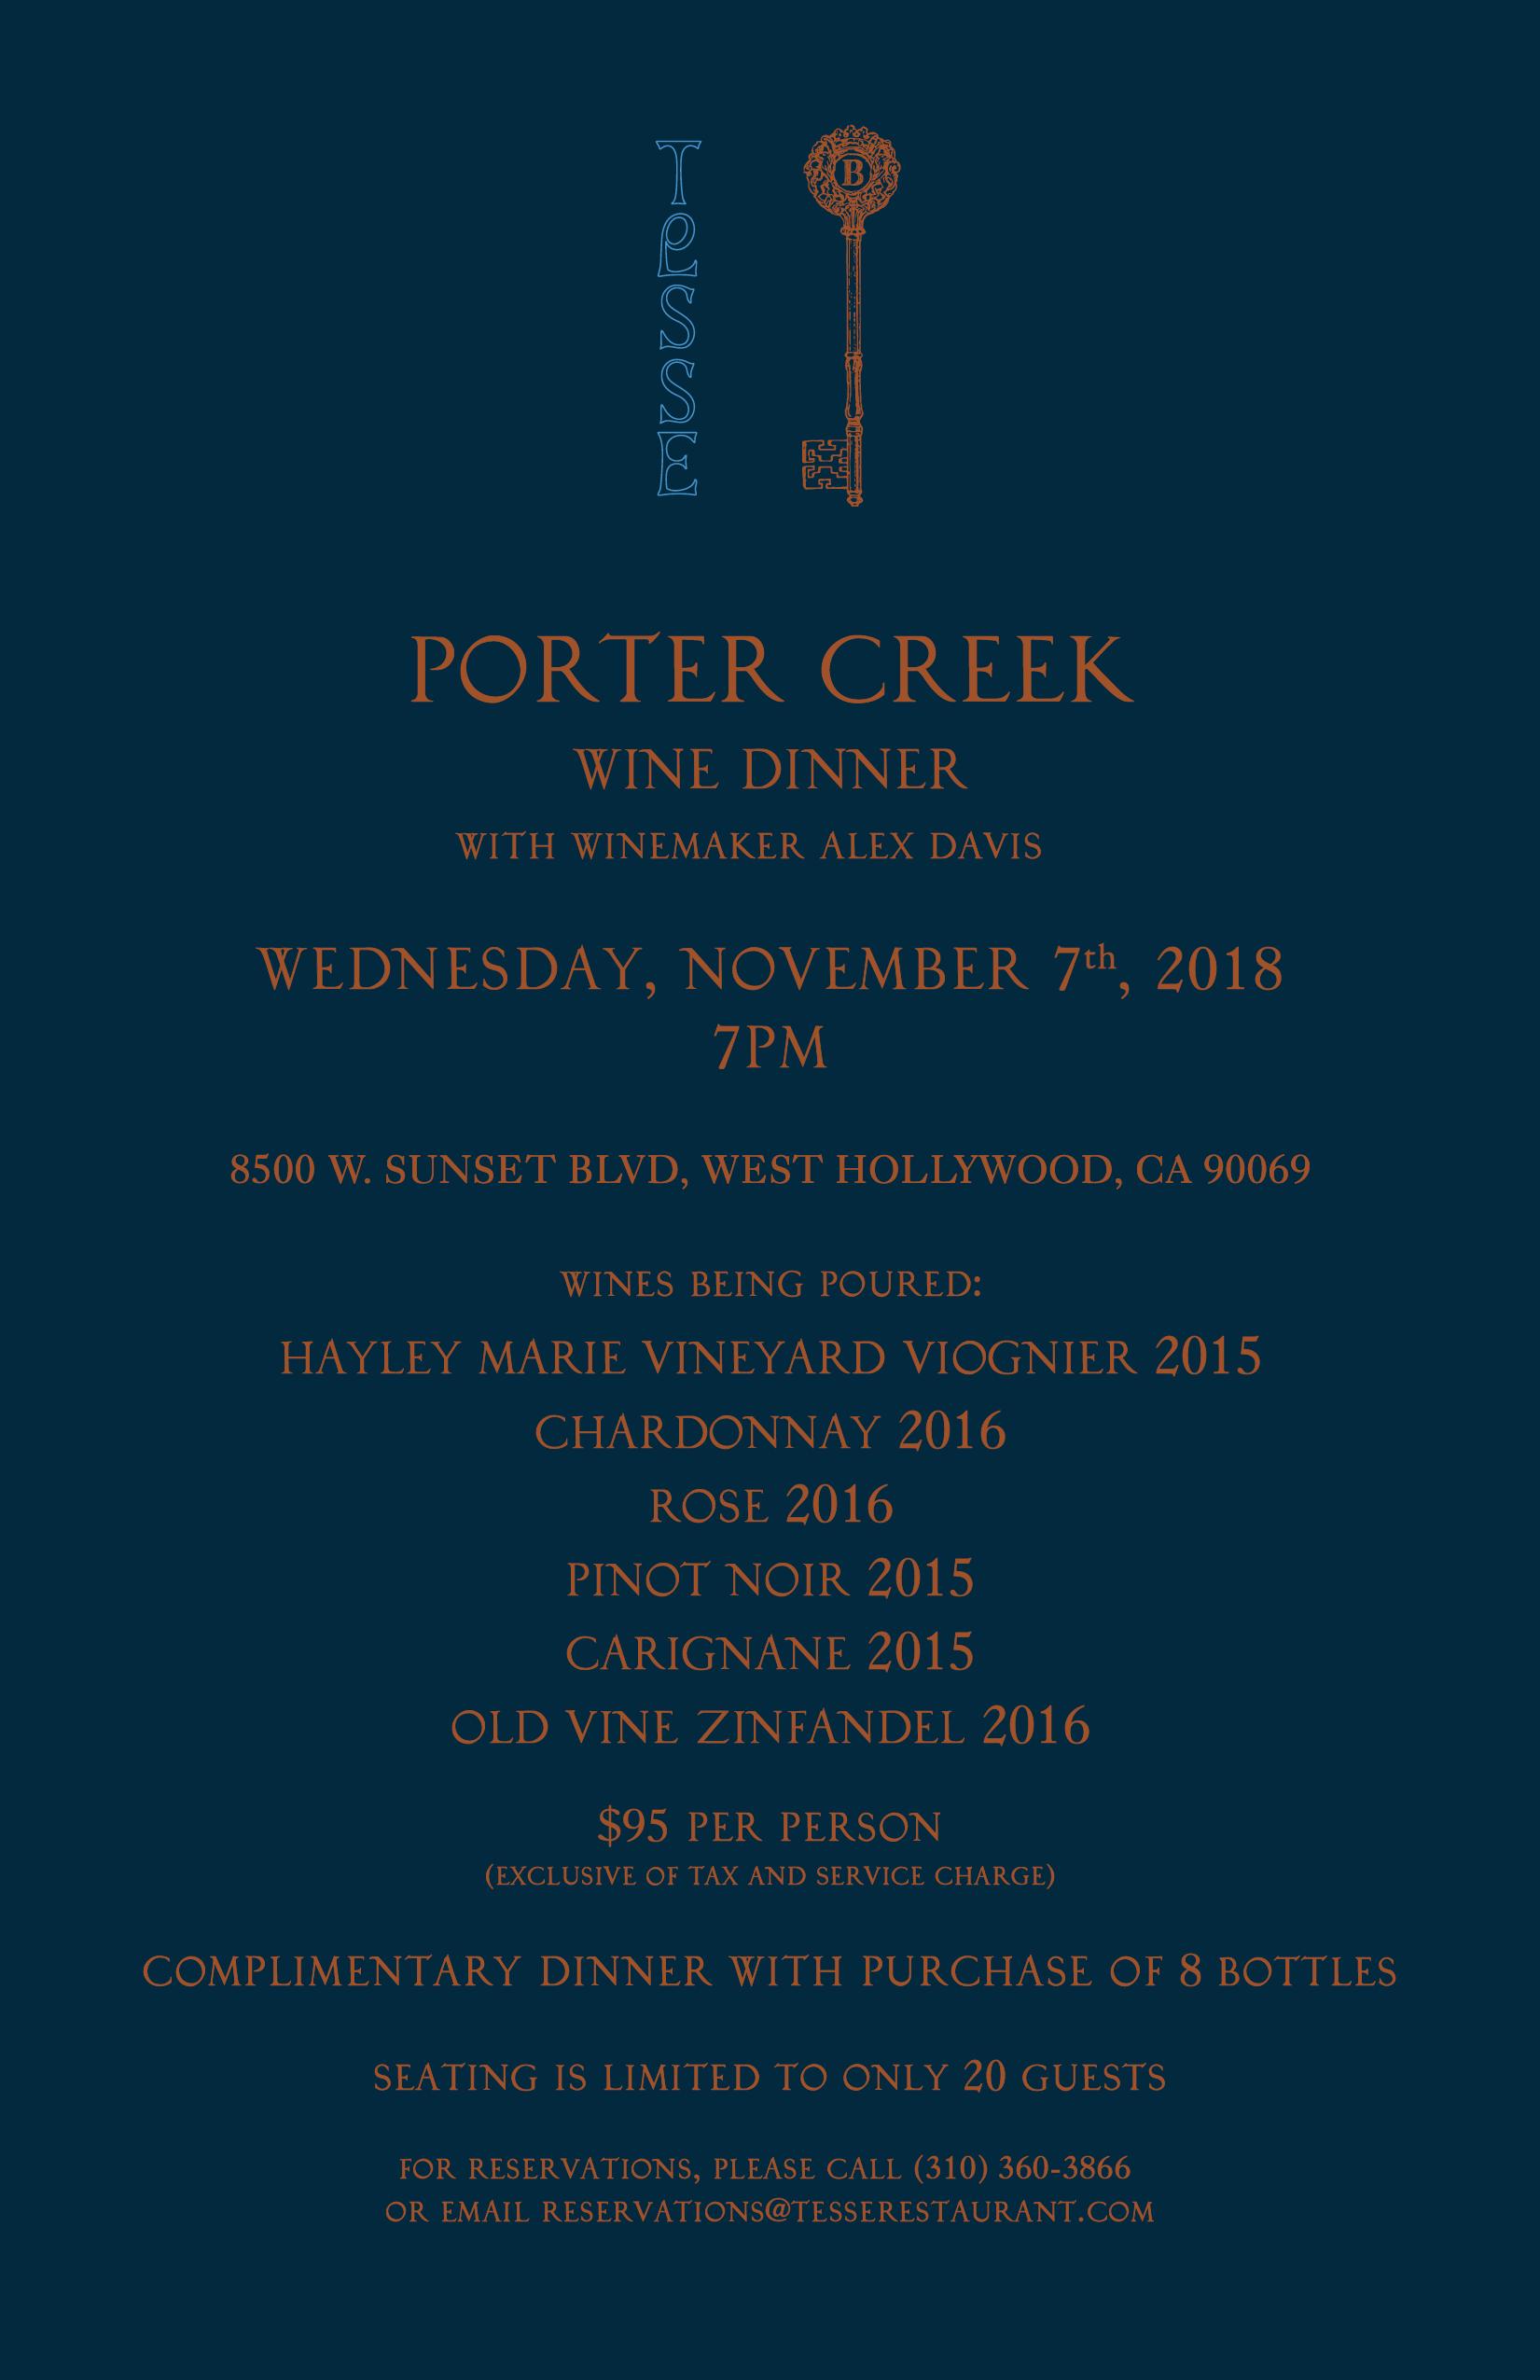 Porter Creek Wine Dinner Invite.png